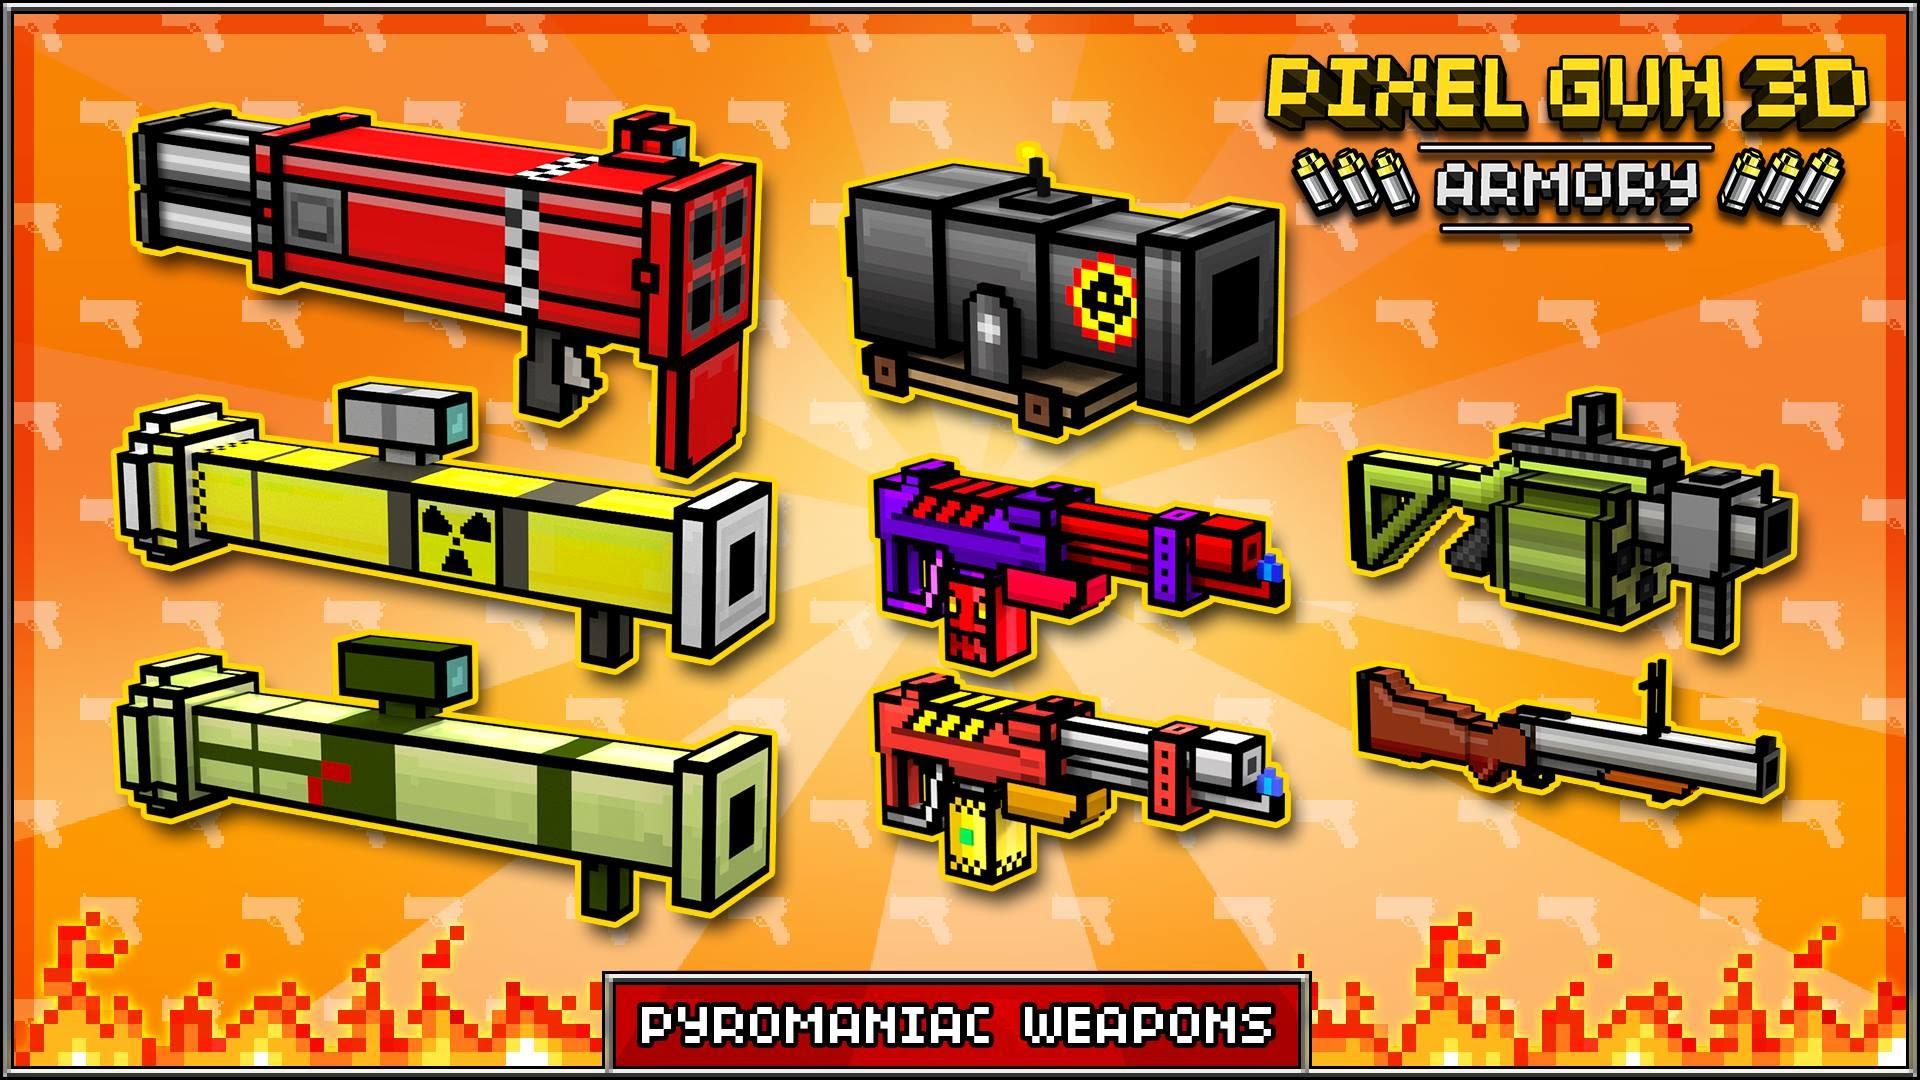 Pixel Gun 3d Wallpaper pixel gun 3d premium weapons   youtube 1920x1080